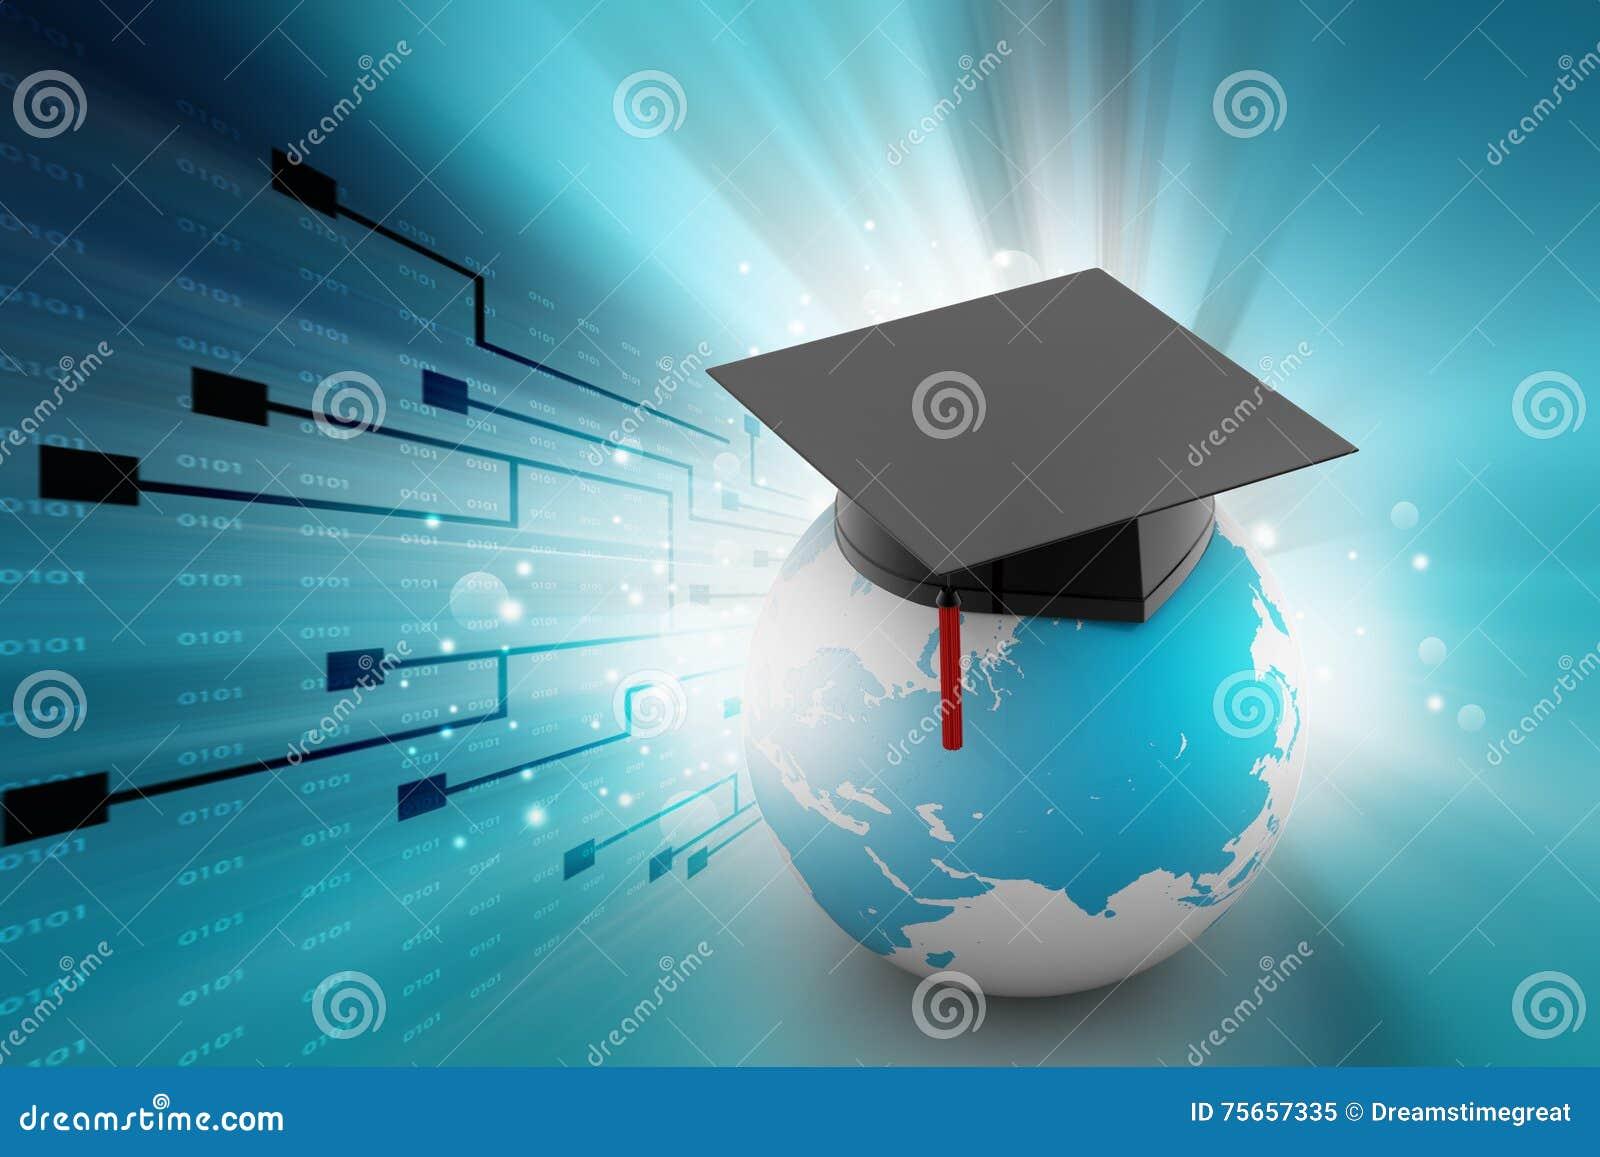 higher educational background wwwpixsharkcom images